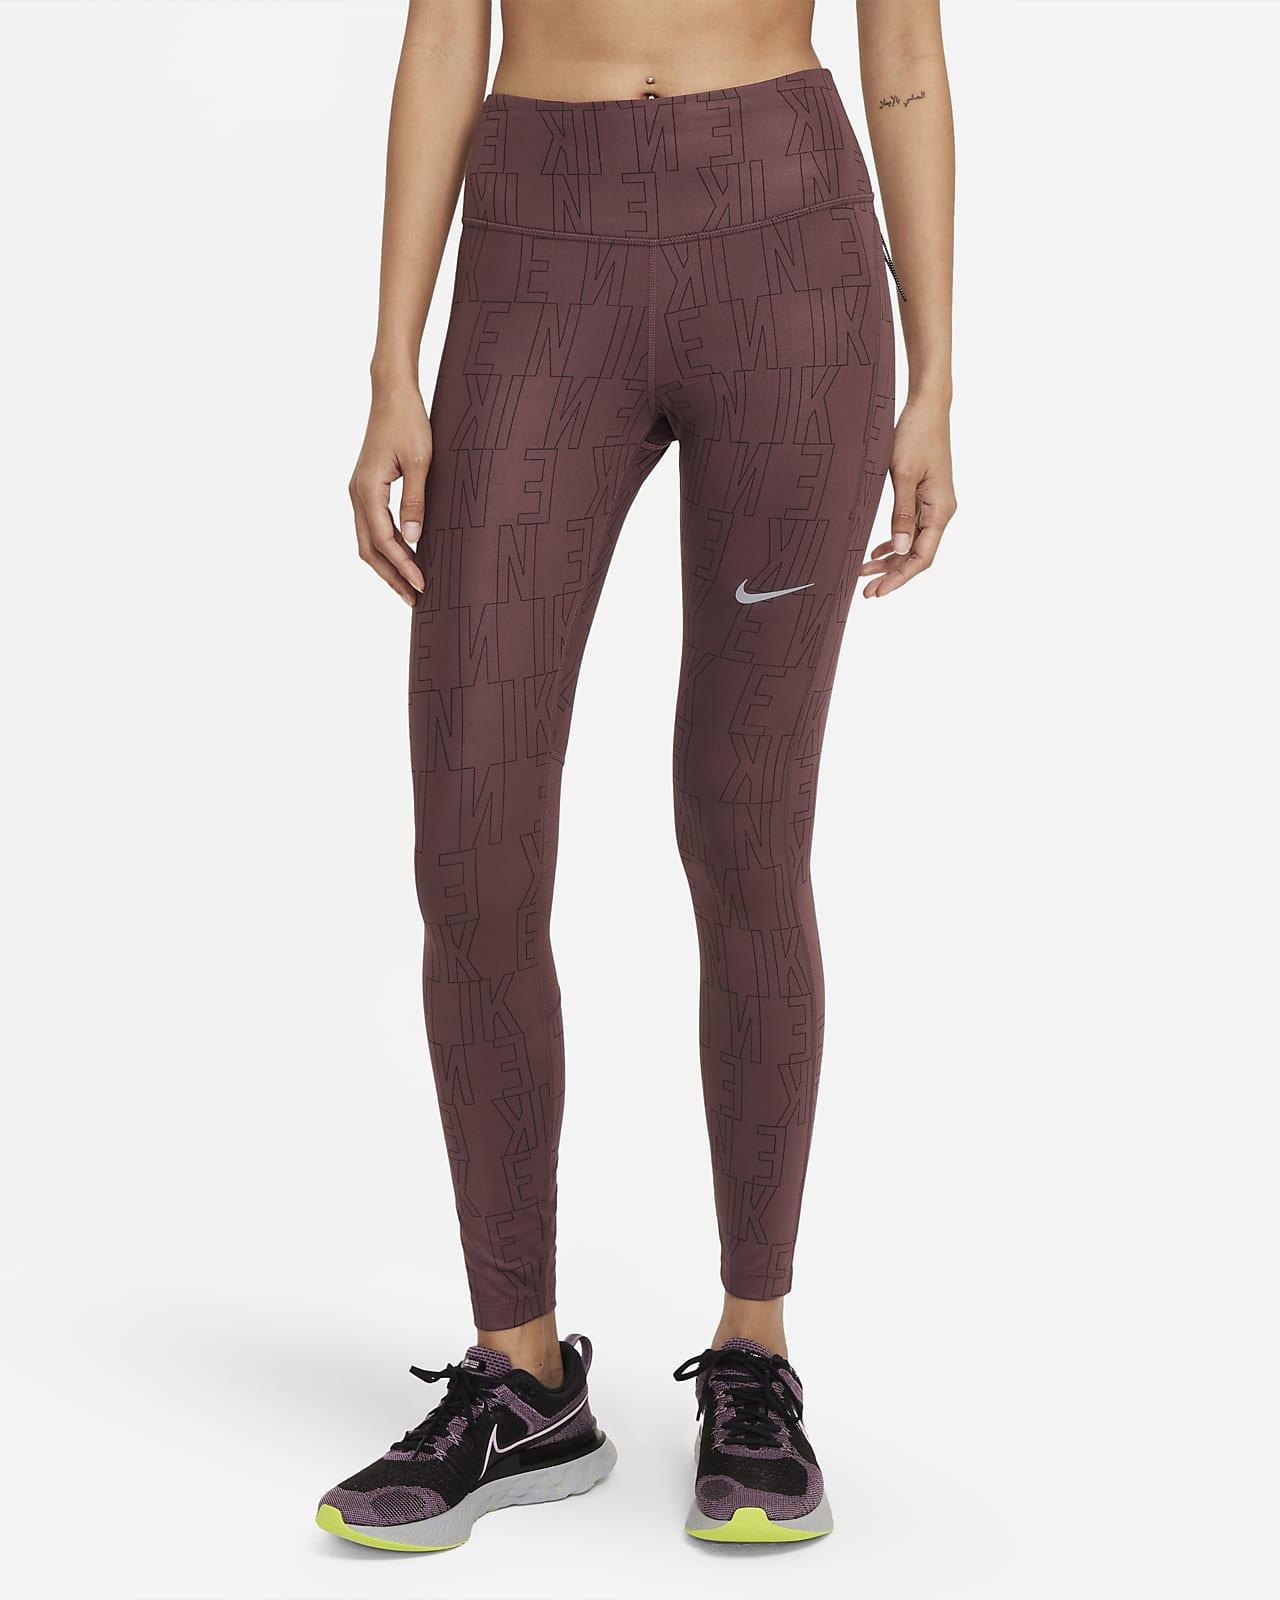 Nike Dri-FIT Run Division Epic Fast Normal Belli Kadın Koşu Taytı